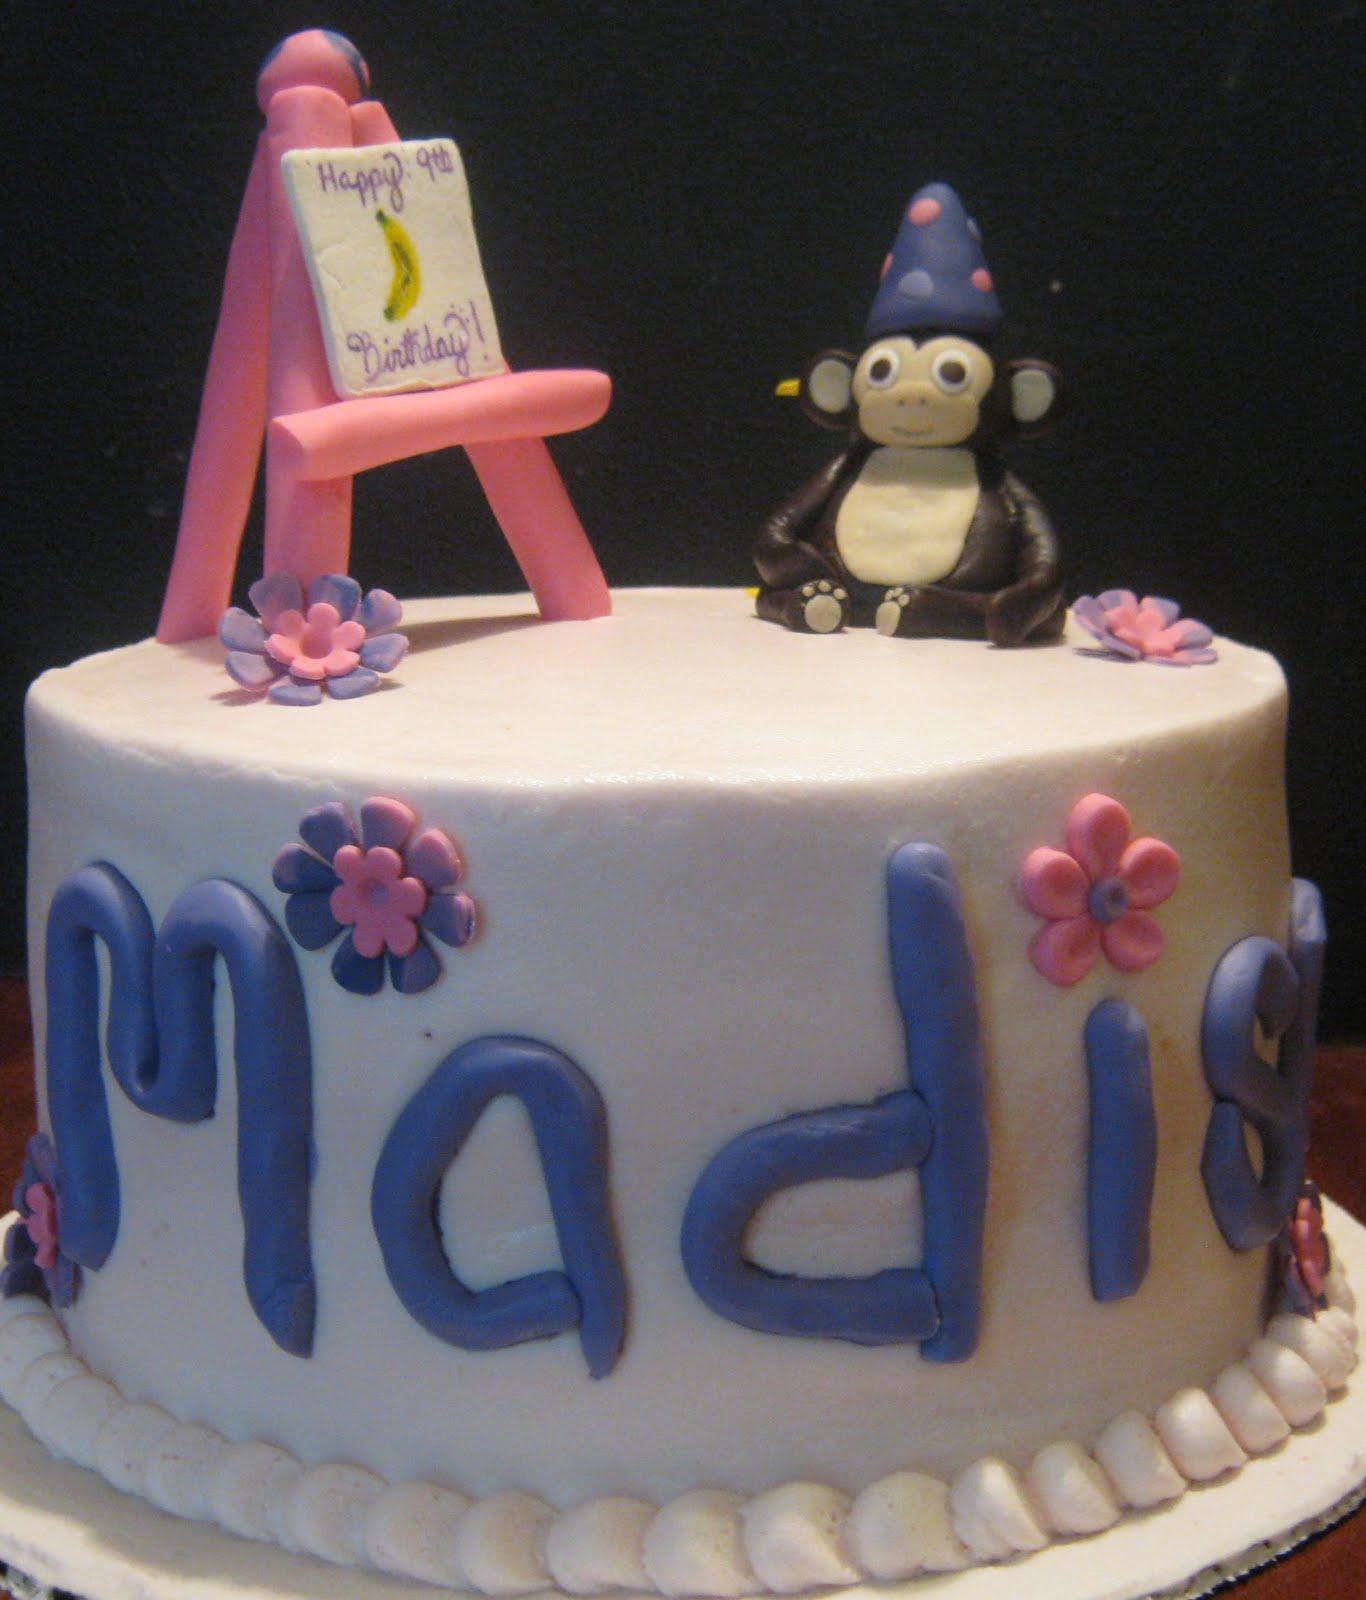 Sweet Ts Cake Design Artistic Sculpted Monkey Birthday Cake